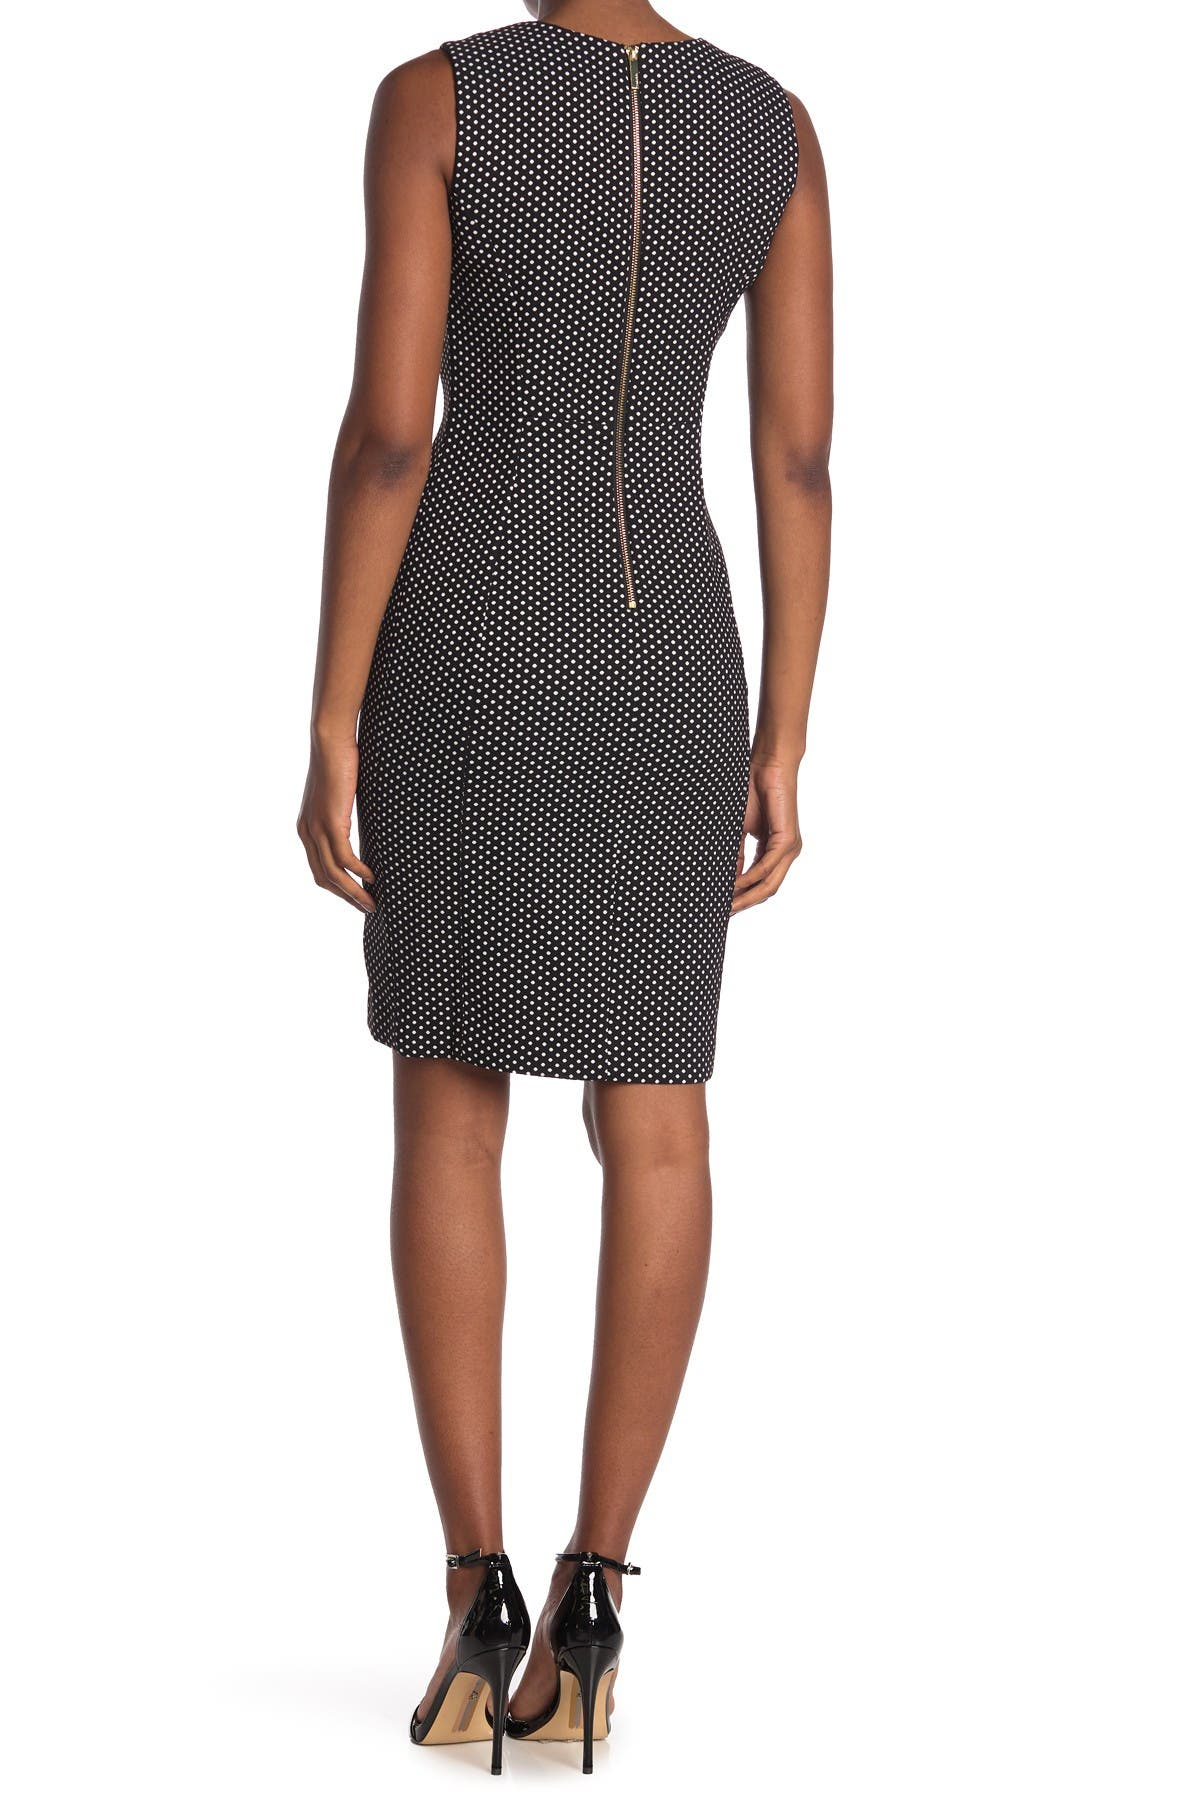 Image of Calvin Klein Dot Sheath Dress